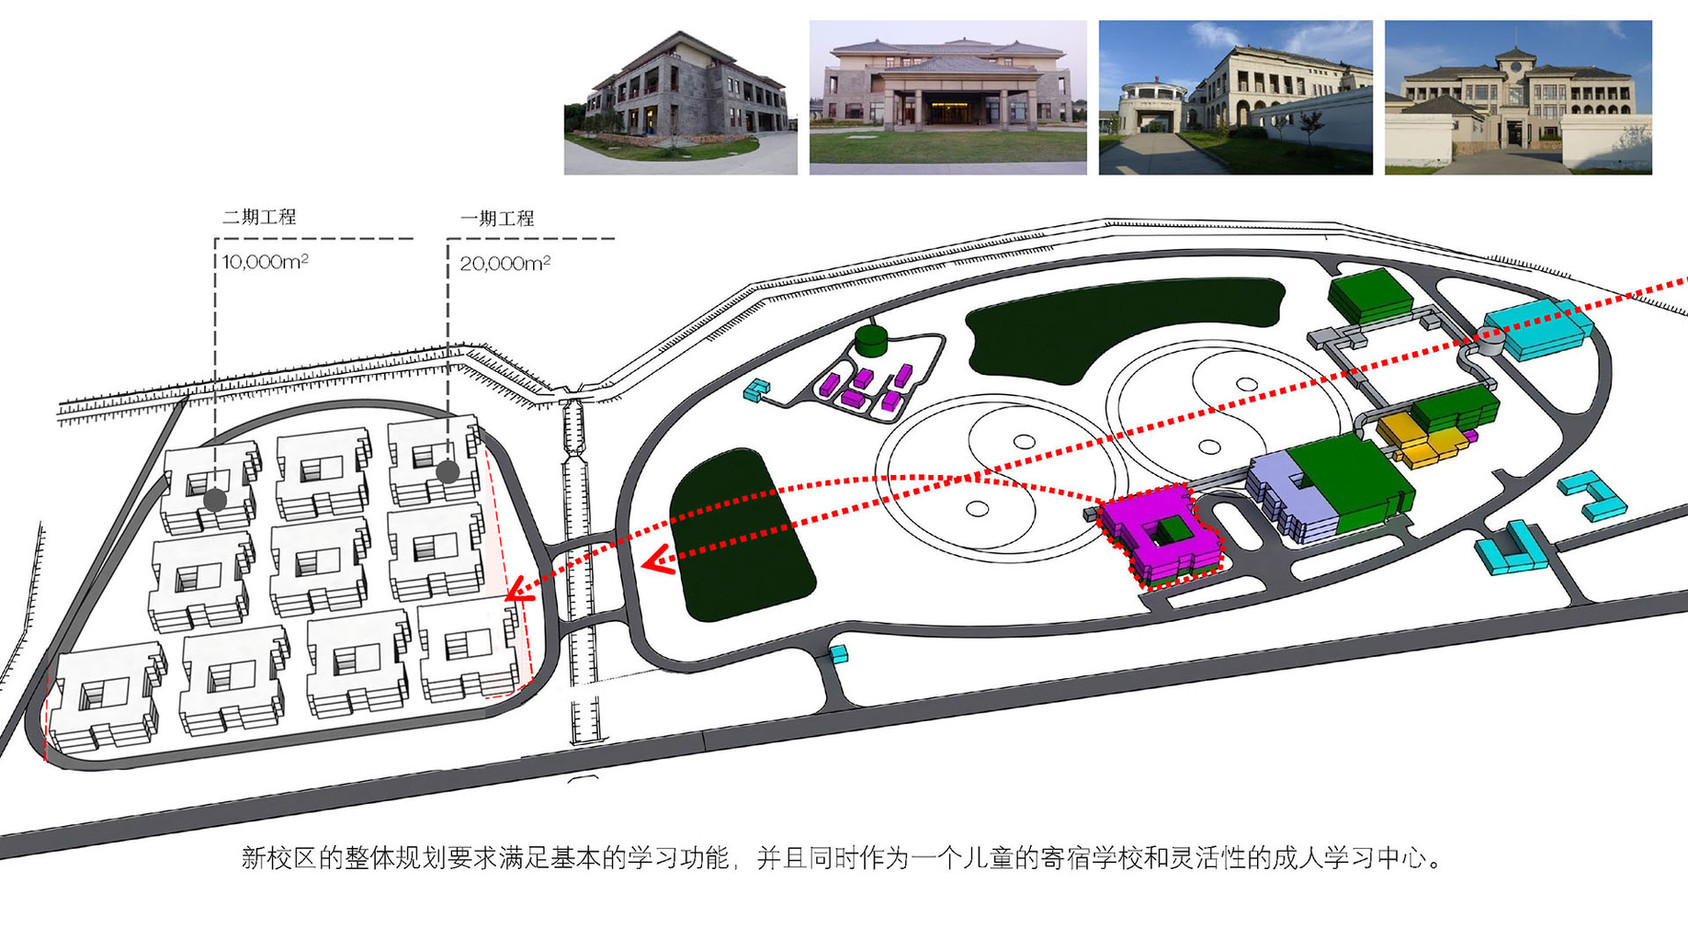 TAIHU-INTERNATIONAL-SCHOOL-CAMPUS-ZH 02.